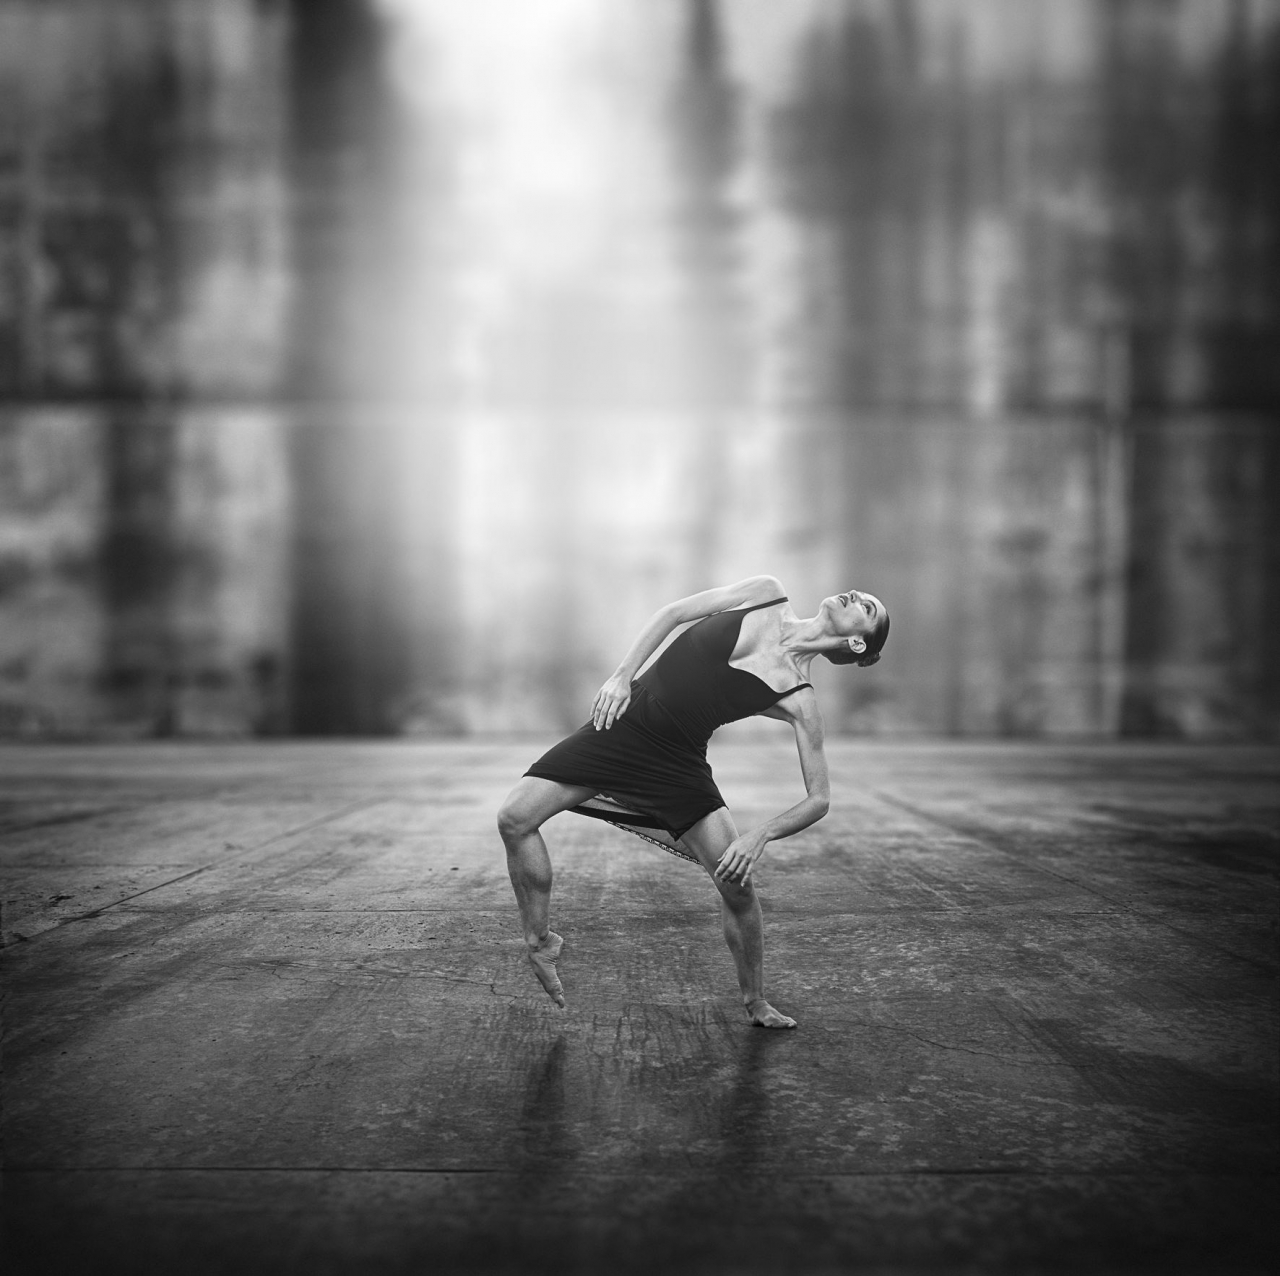 Valentina-Moar-asphalt-2016-ASPHALT-tanzt-1-Foto-Werner_Kmetitsch